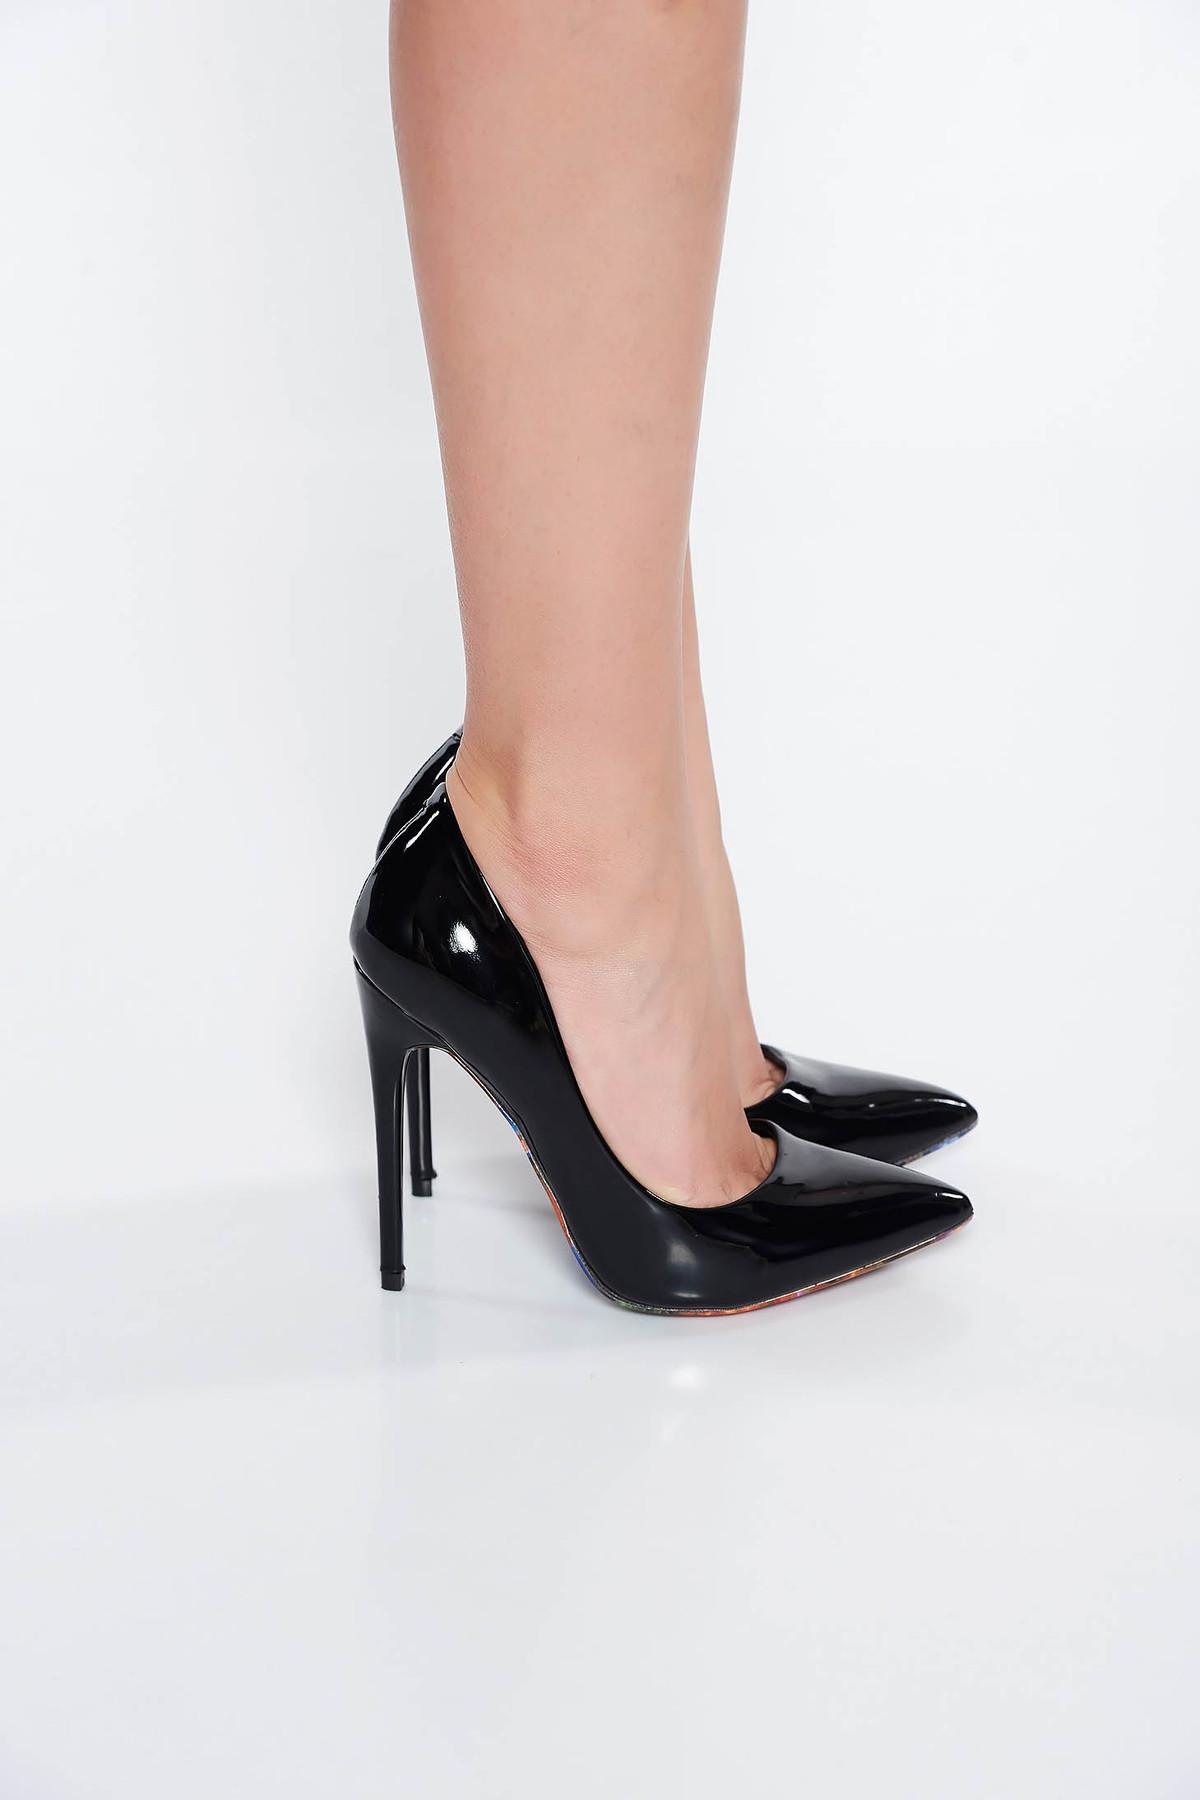 Pantofi negru elegant cu toc inalt din piele ecologica lacuita cu varful usor ascutit